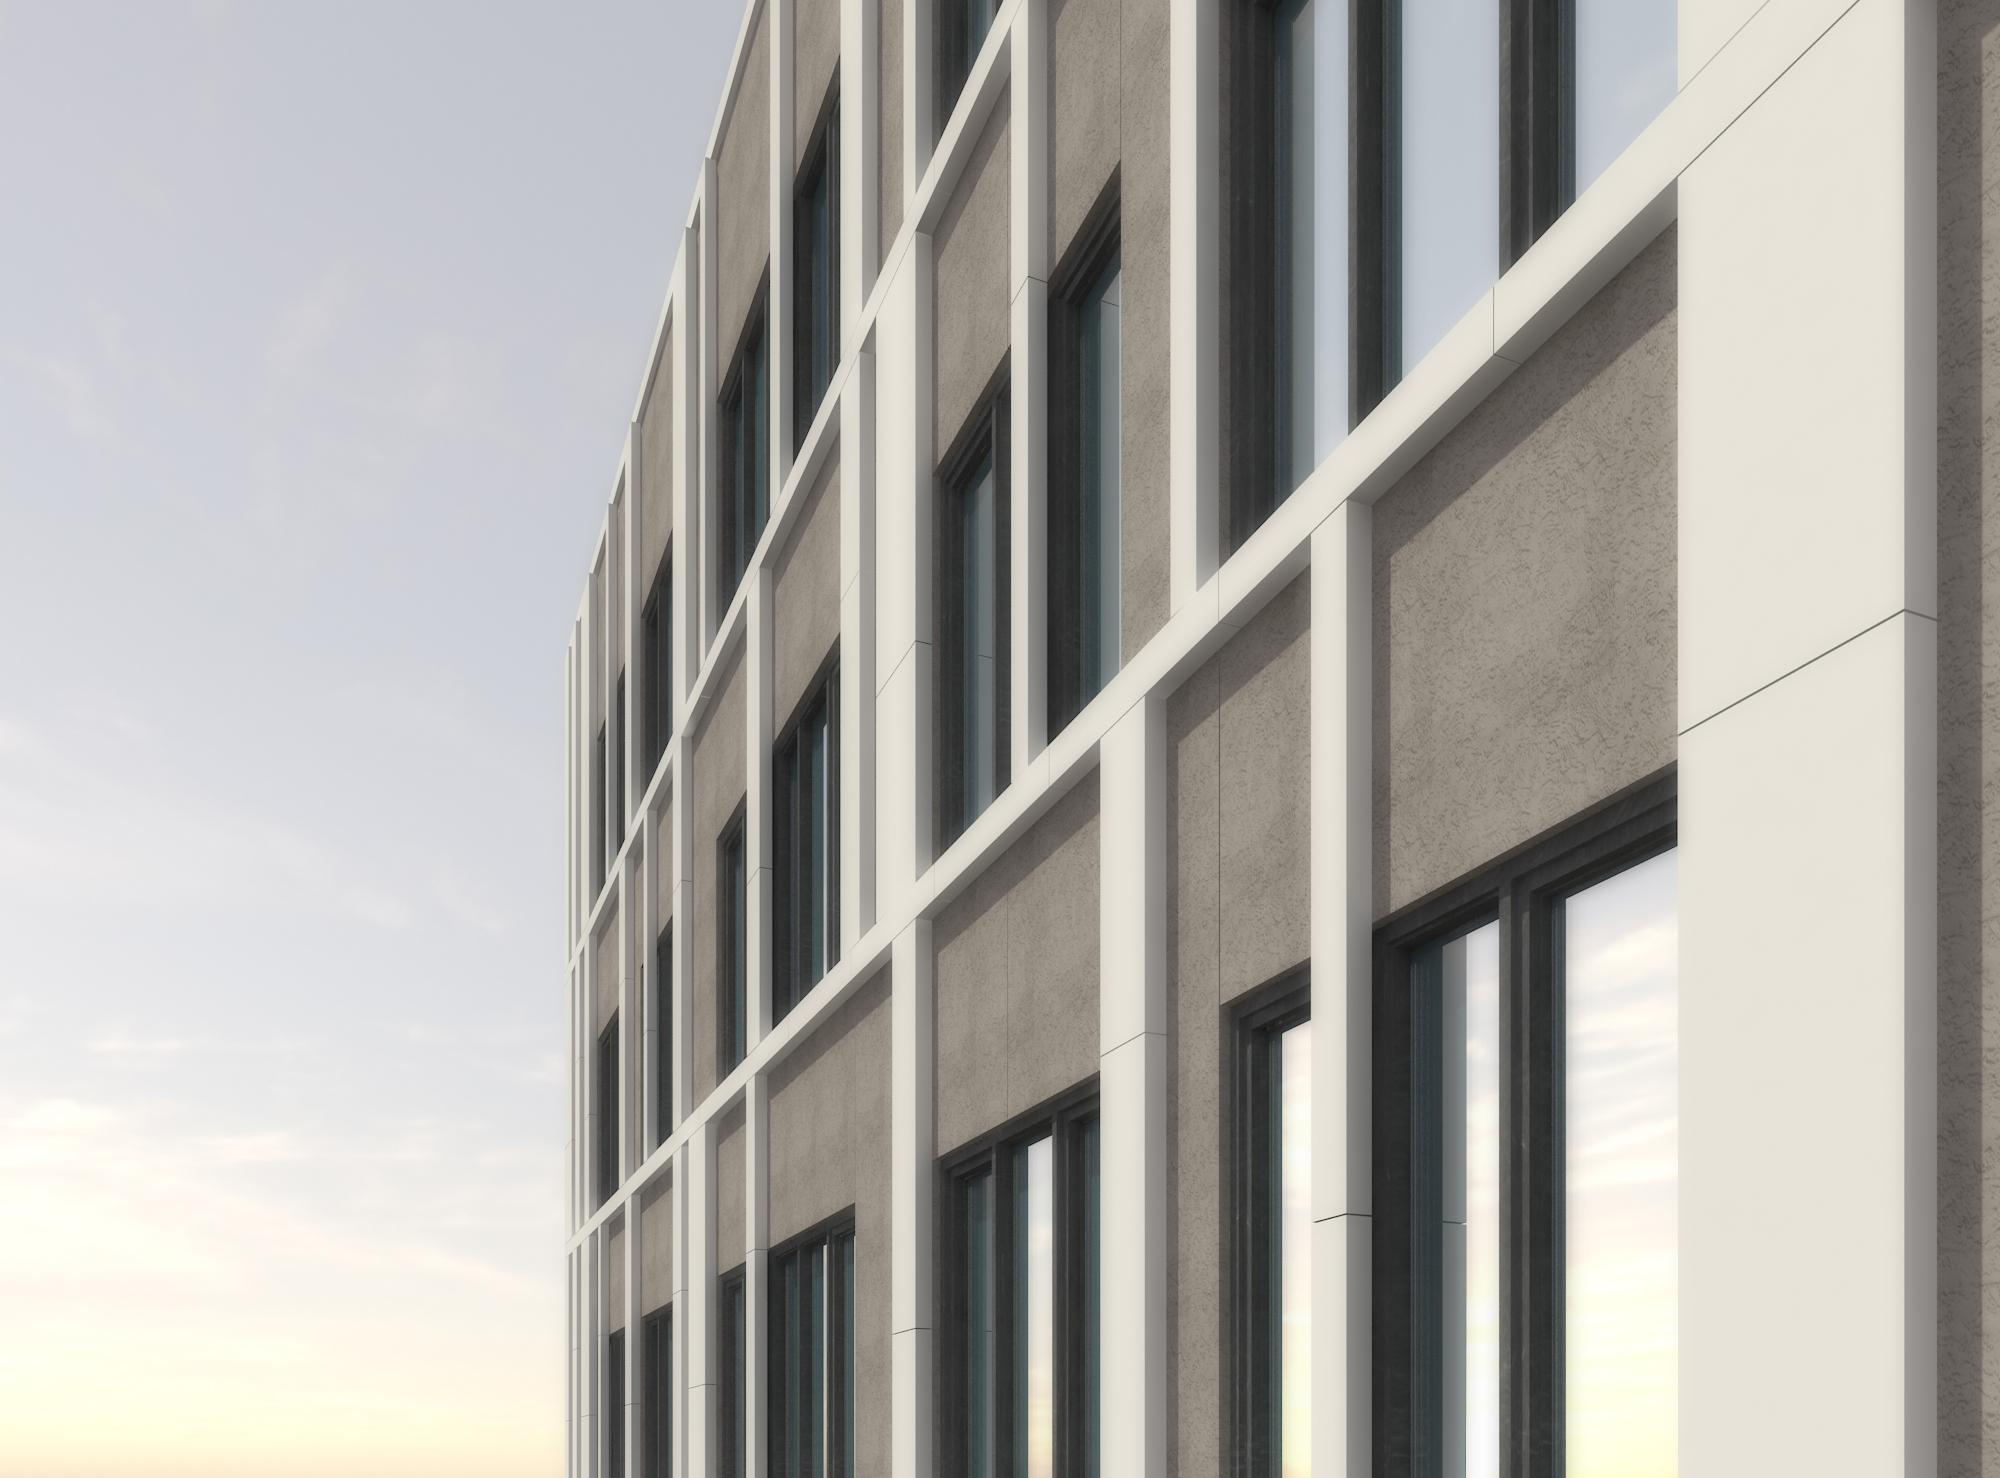 facade detail: aluminum composite panel and glass fibre cement panel